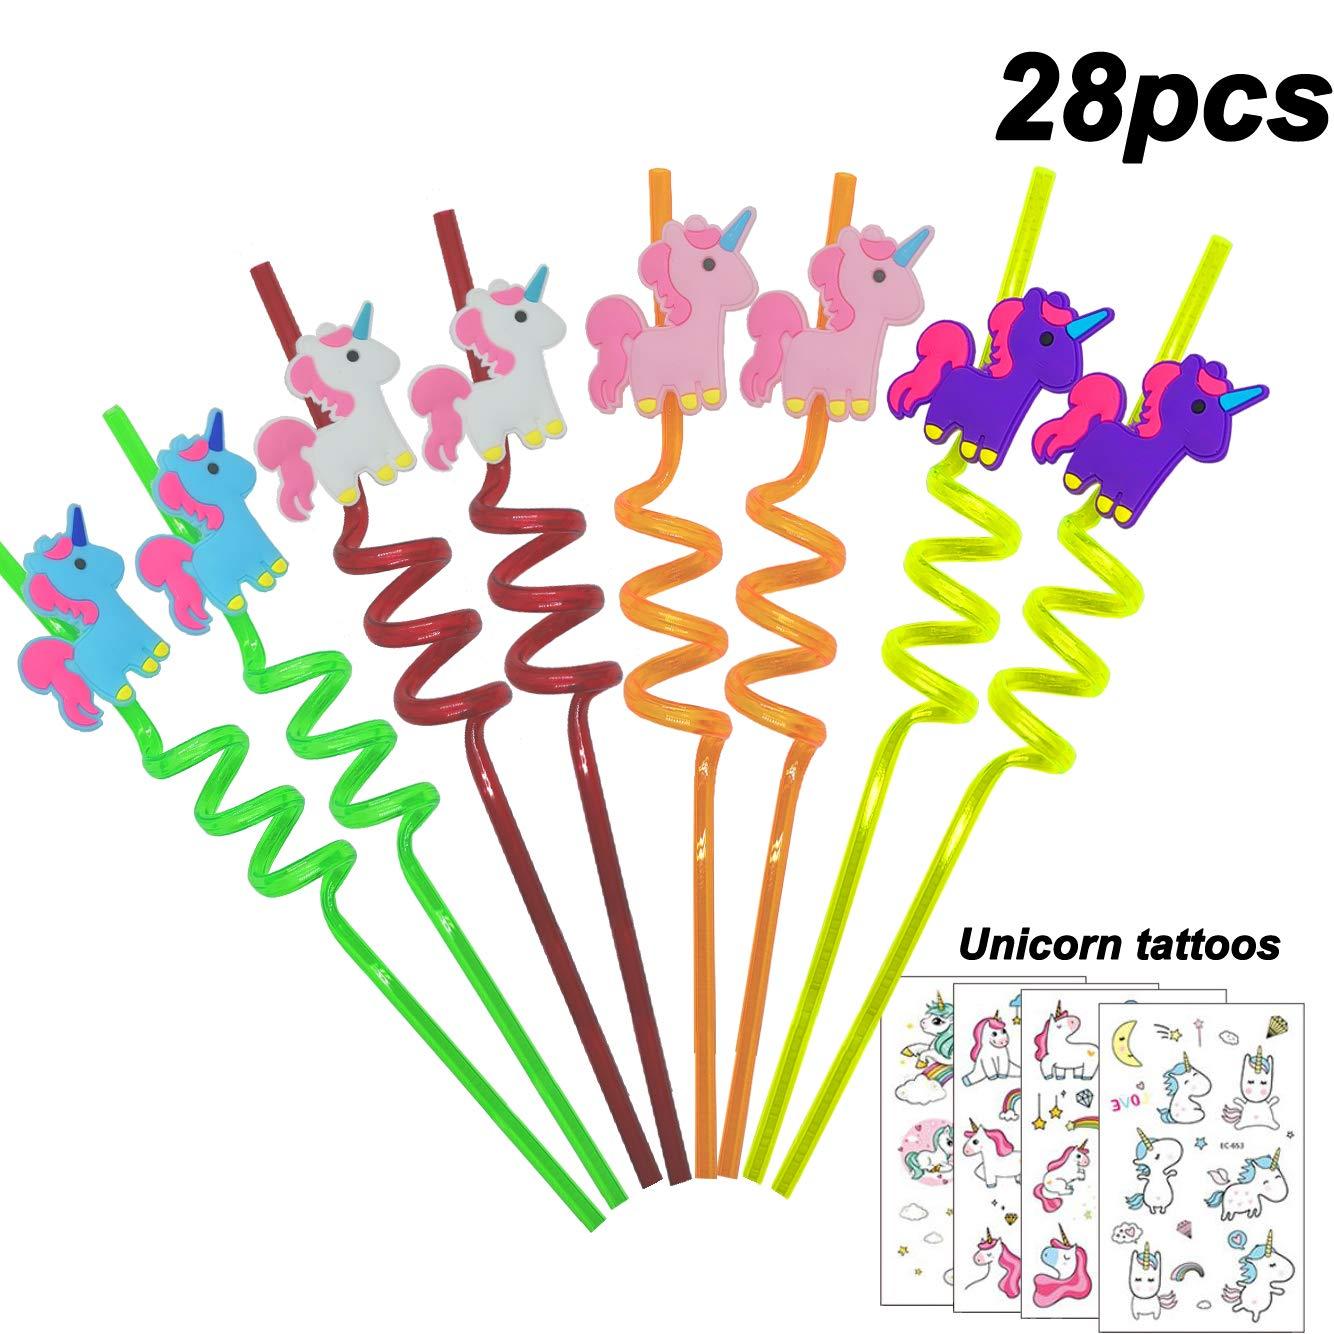 Rainbow Unicorn Party Favors Decorations Set of 28 Unicorn Birthday Party Supplies Unicorn Temporary Tattoos for Girls Reusable Unicorn Drinking Plastic Straws